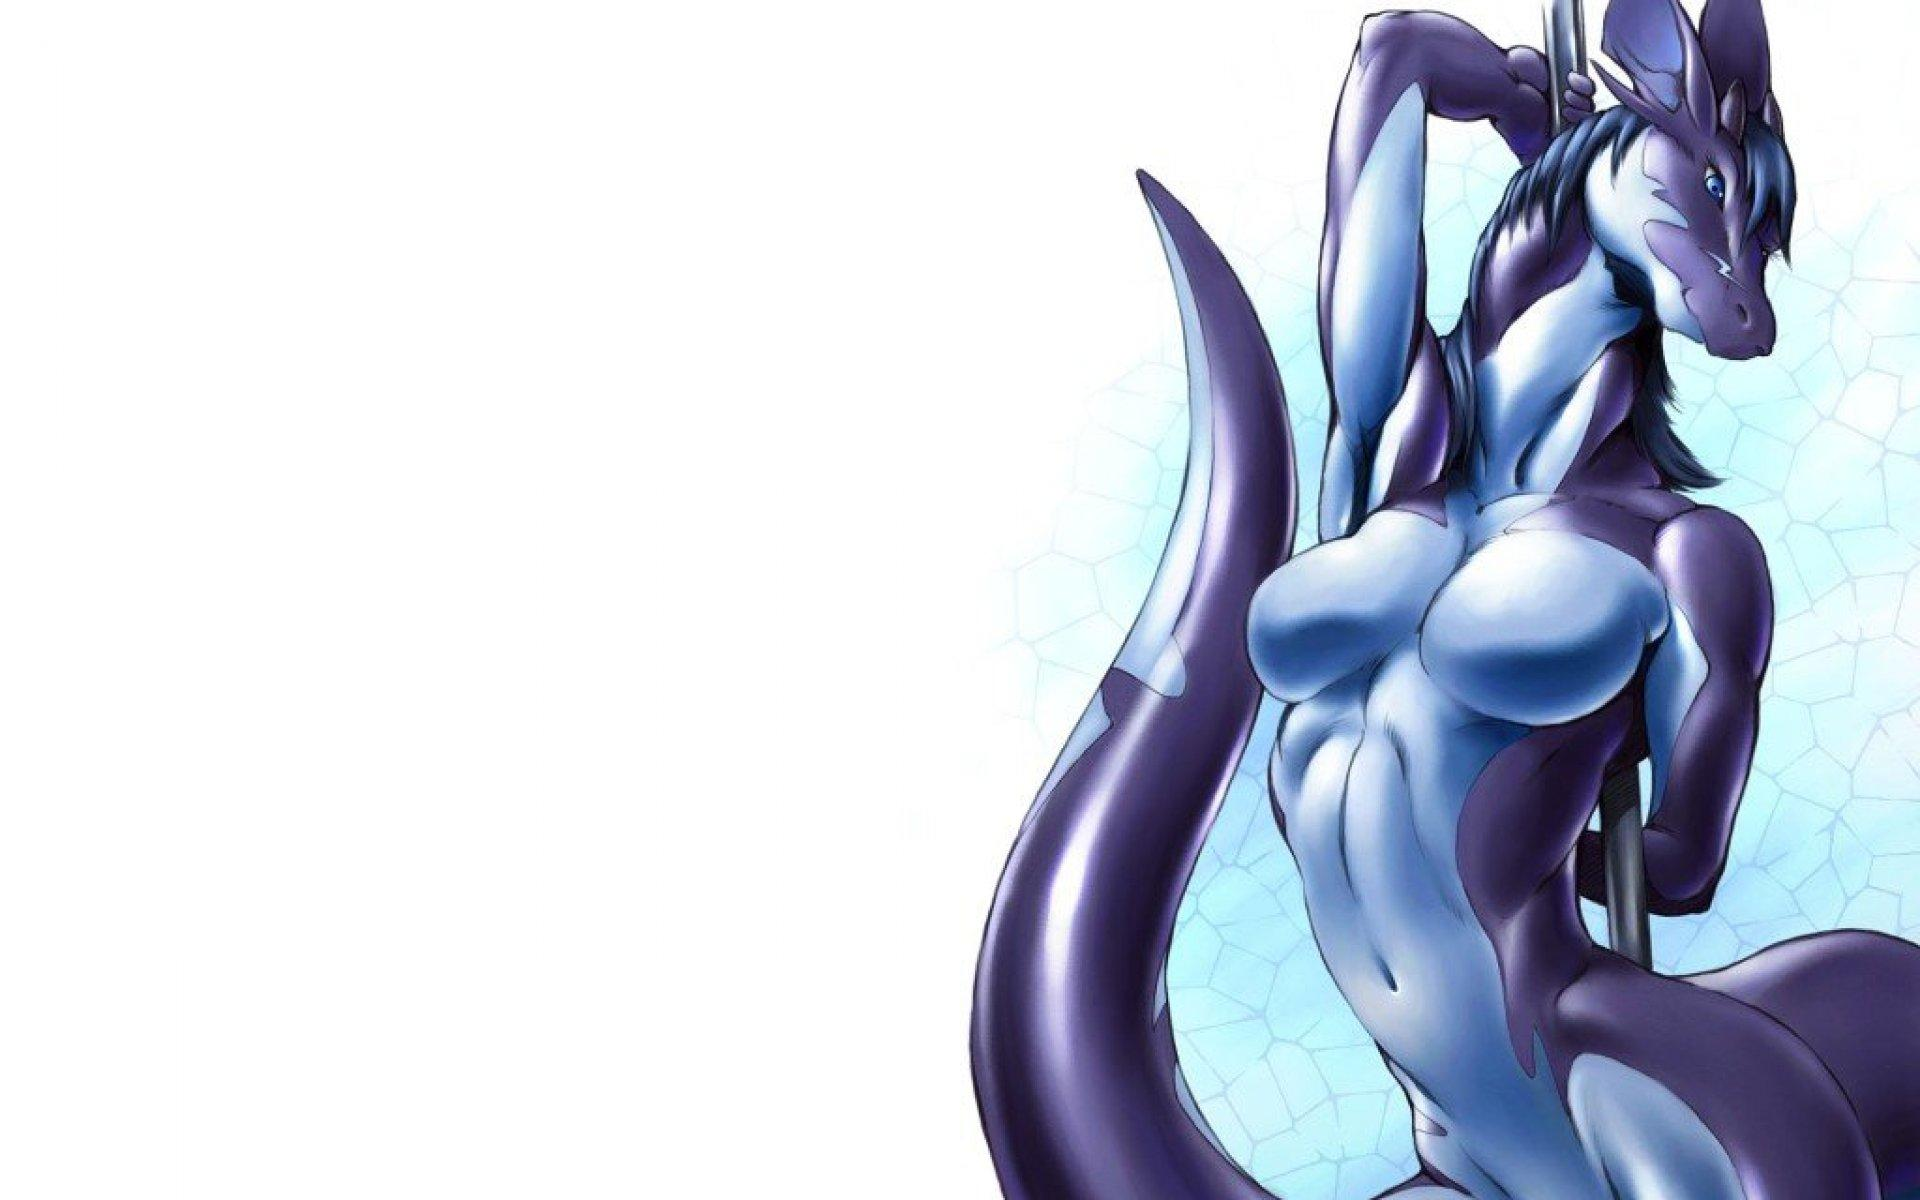 Sexy fantasy dragoness nude pics sexy scenes